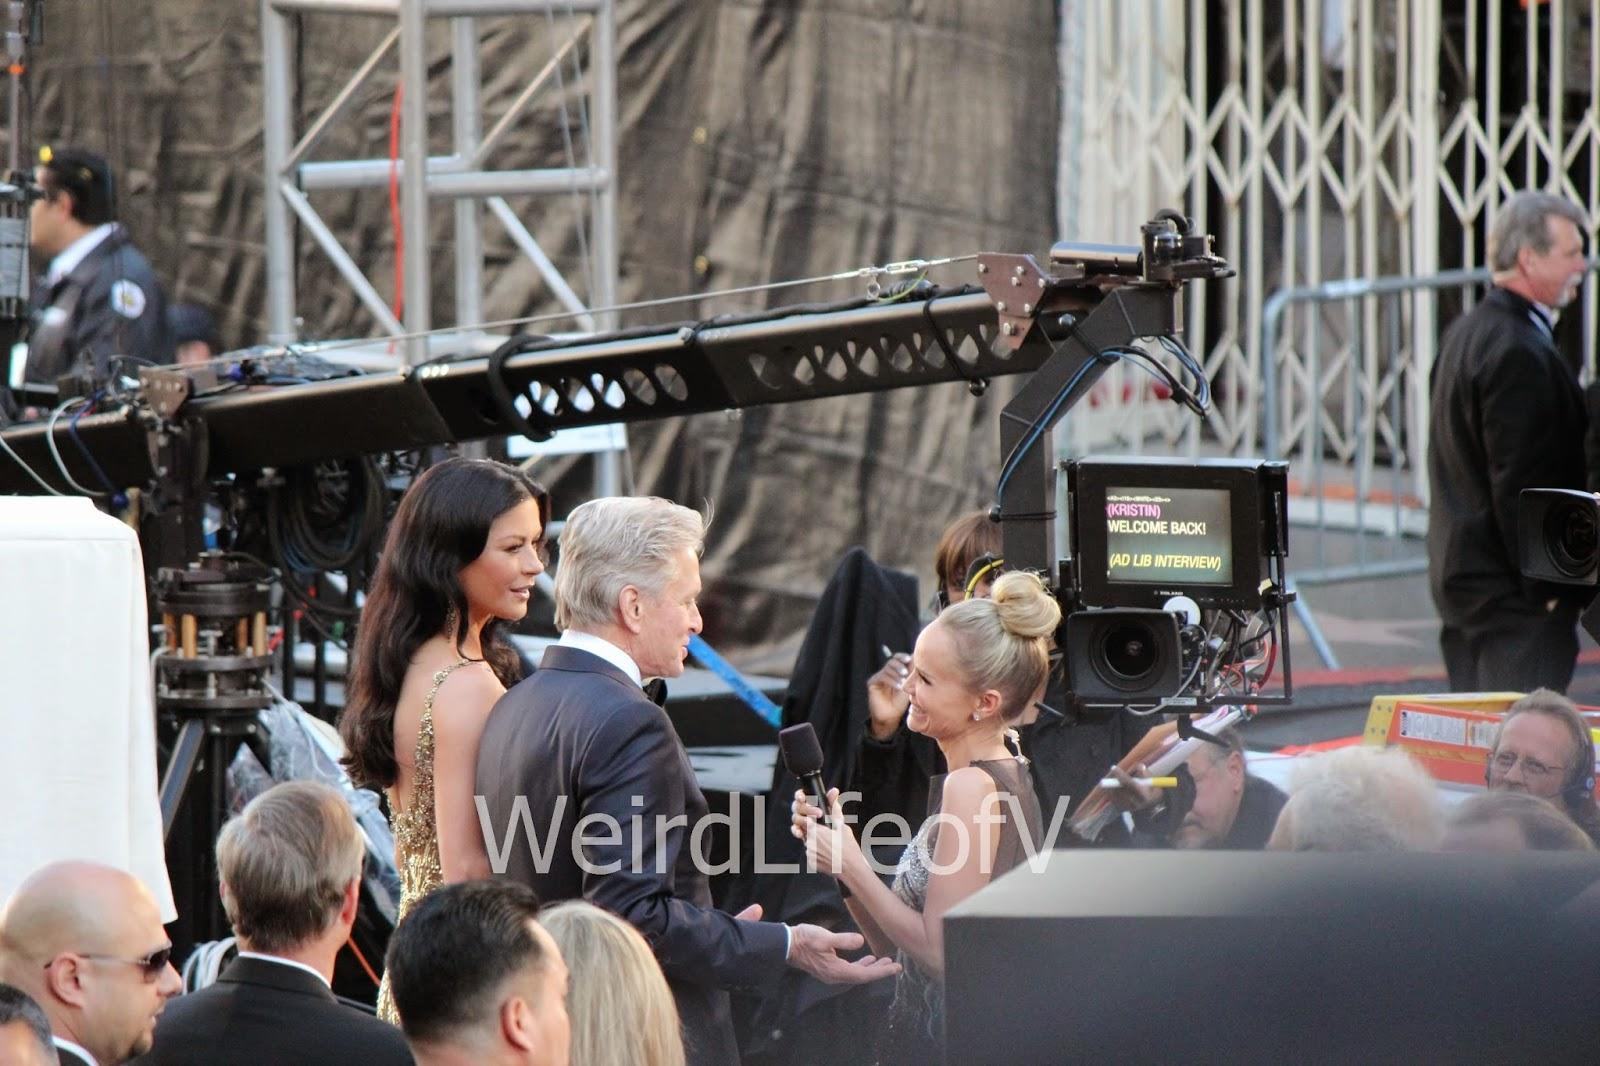 Catherine Zeta-Jones and Michael Douglas being interviewed by Kristin Chenoweth